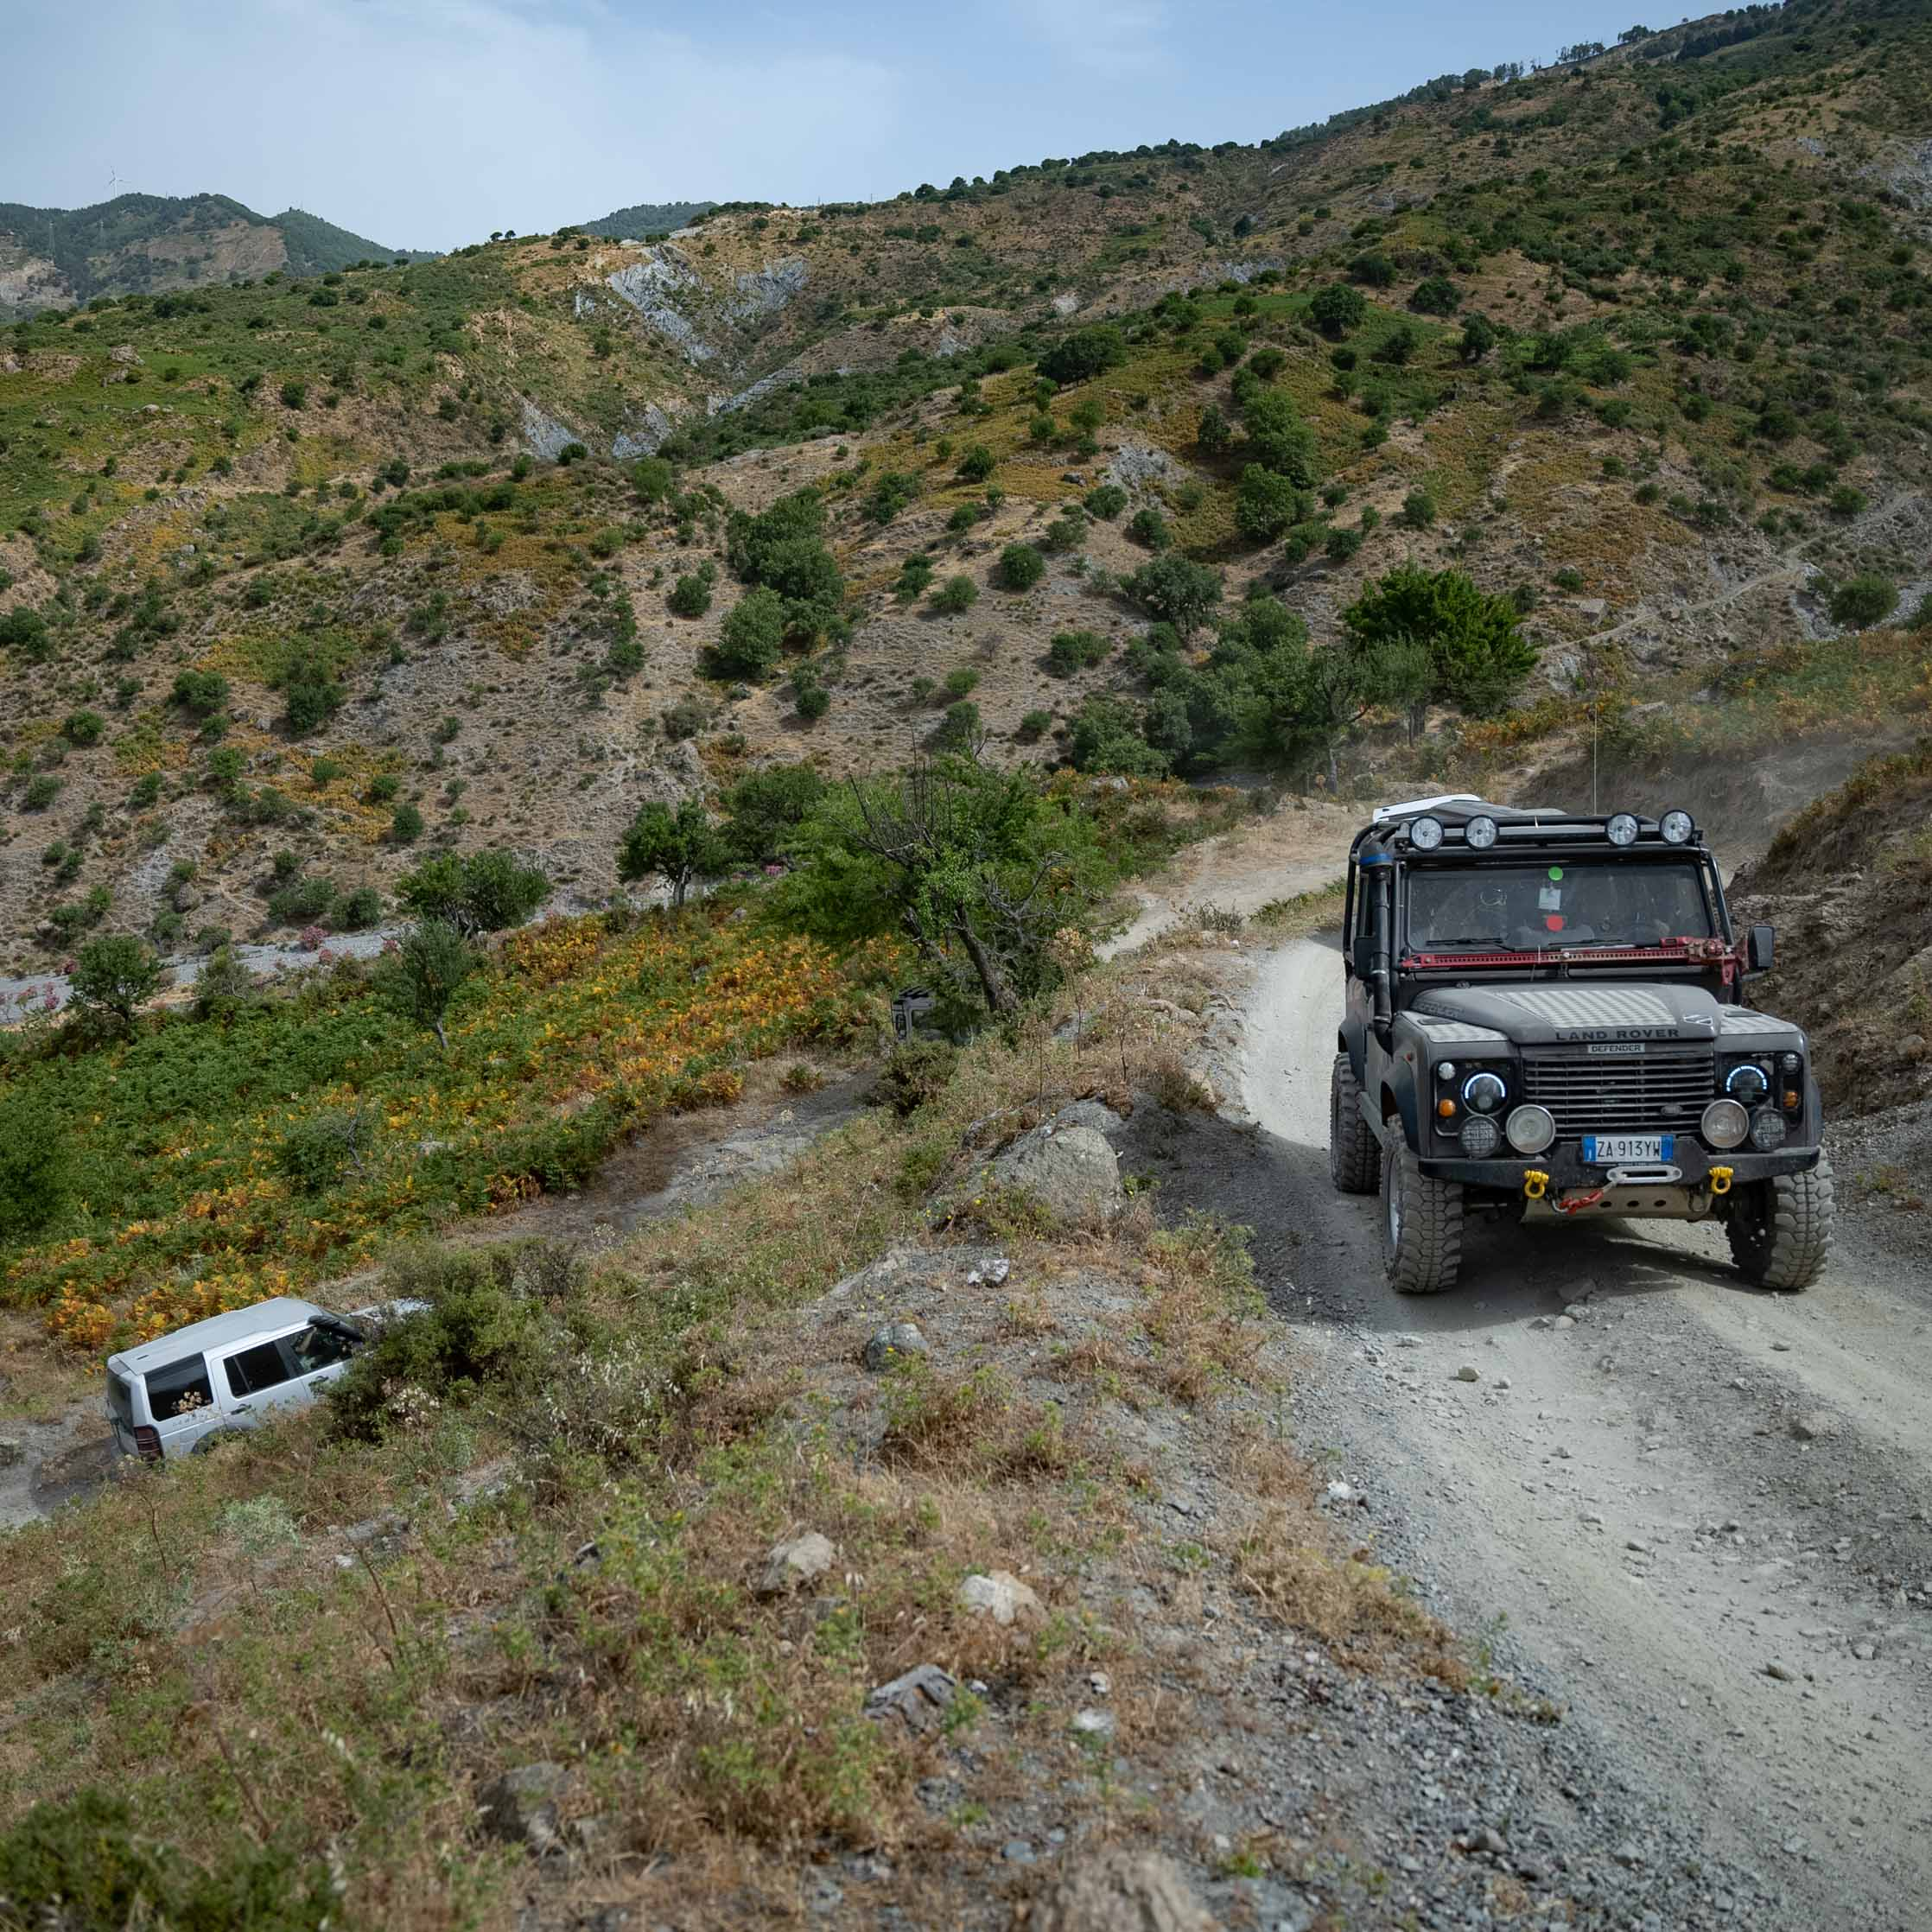 Land_Rover_Tour_Sicilia_2021_Land_Rover_Experience_Italia_-11